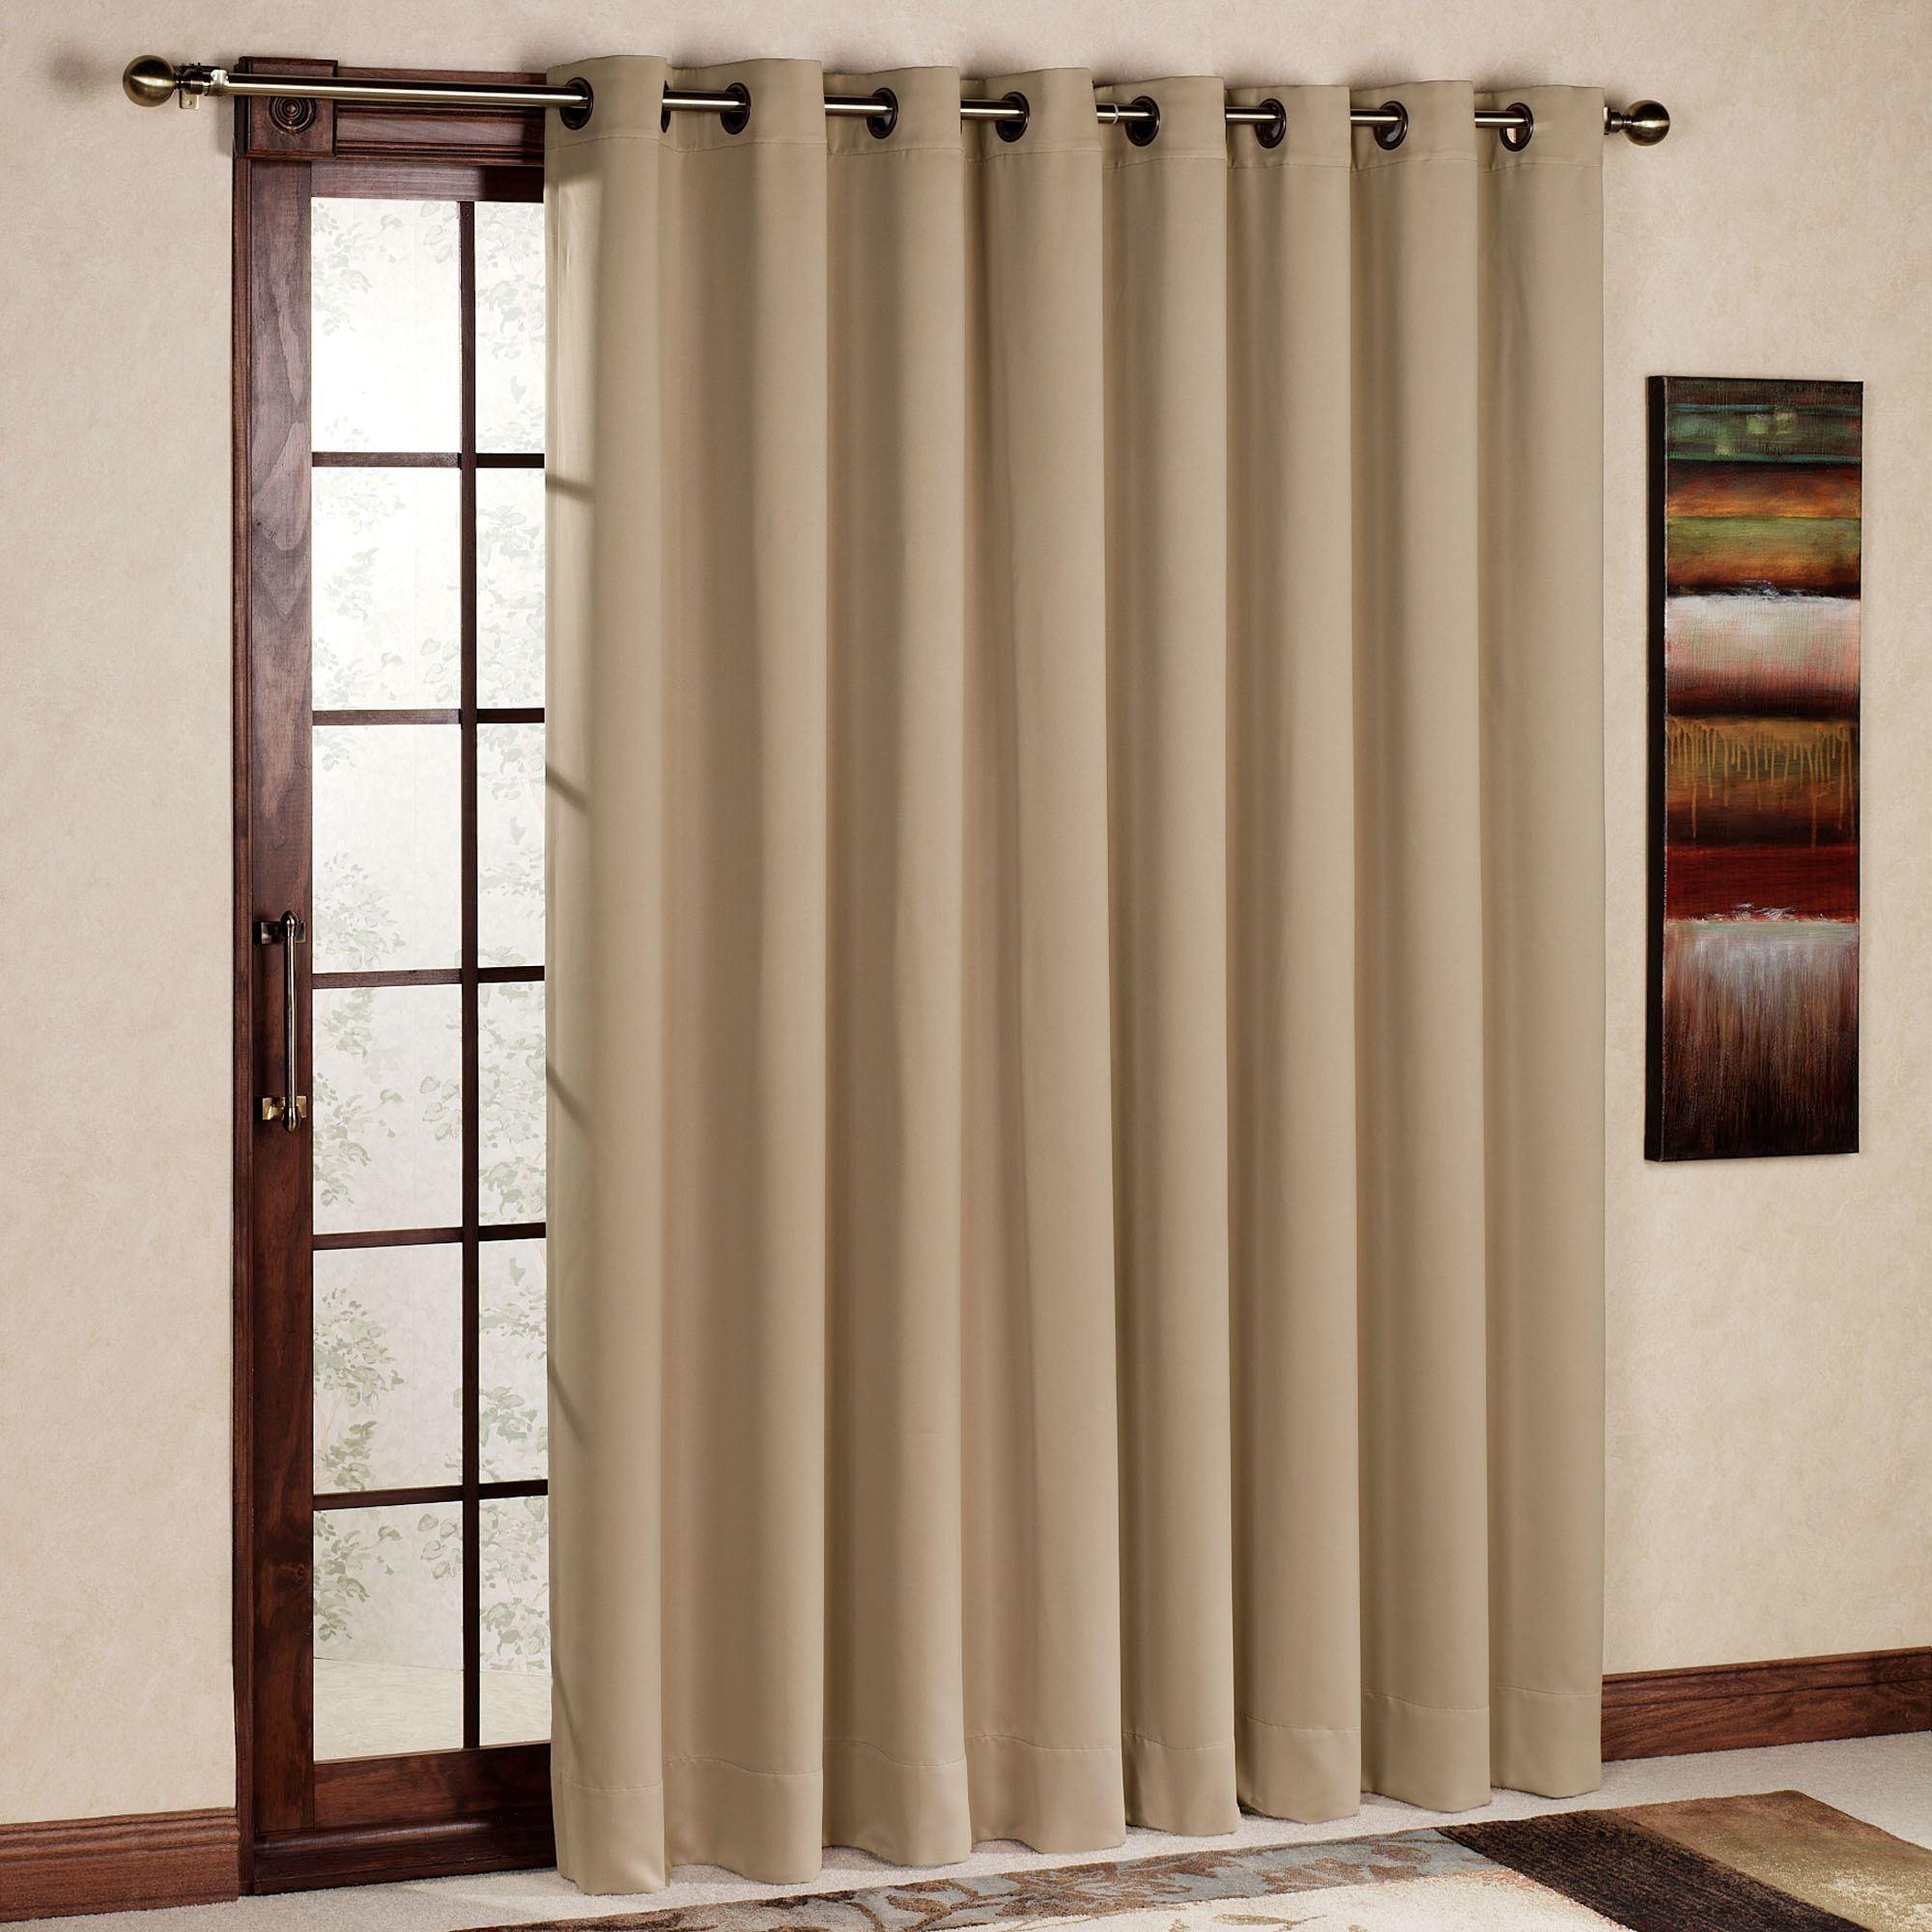 Curtains For Oversized Sliding Doors2000 X 2000